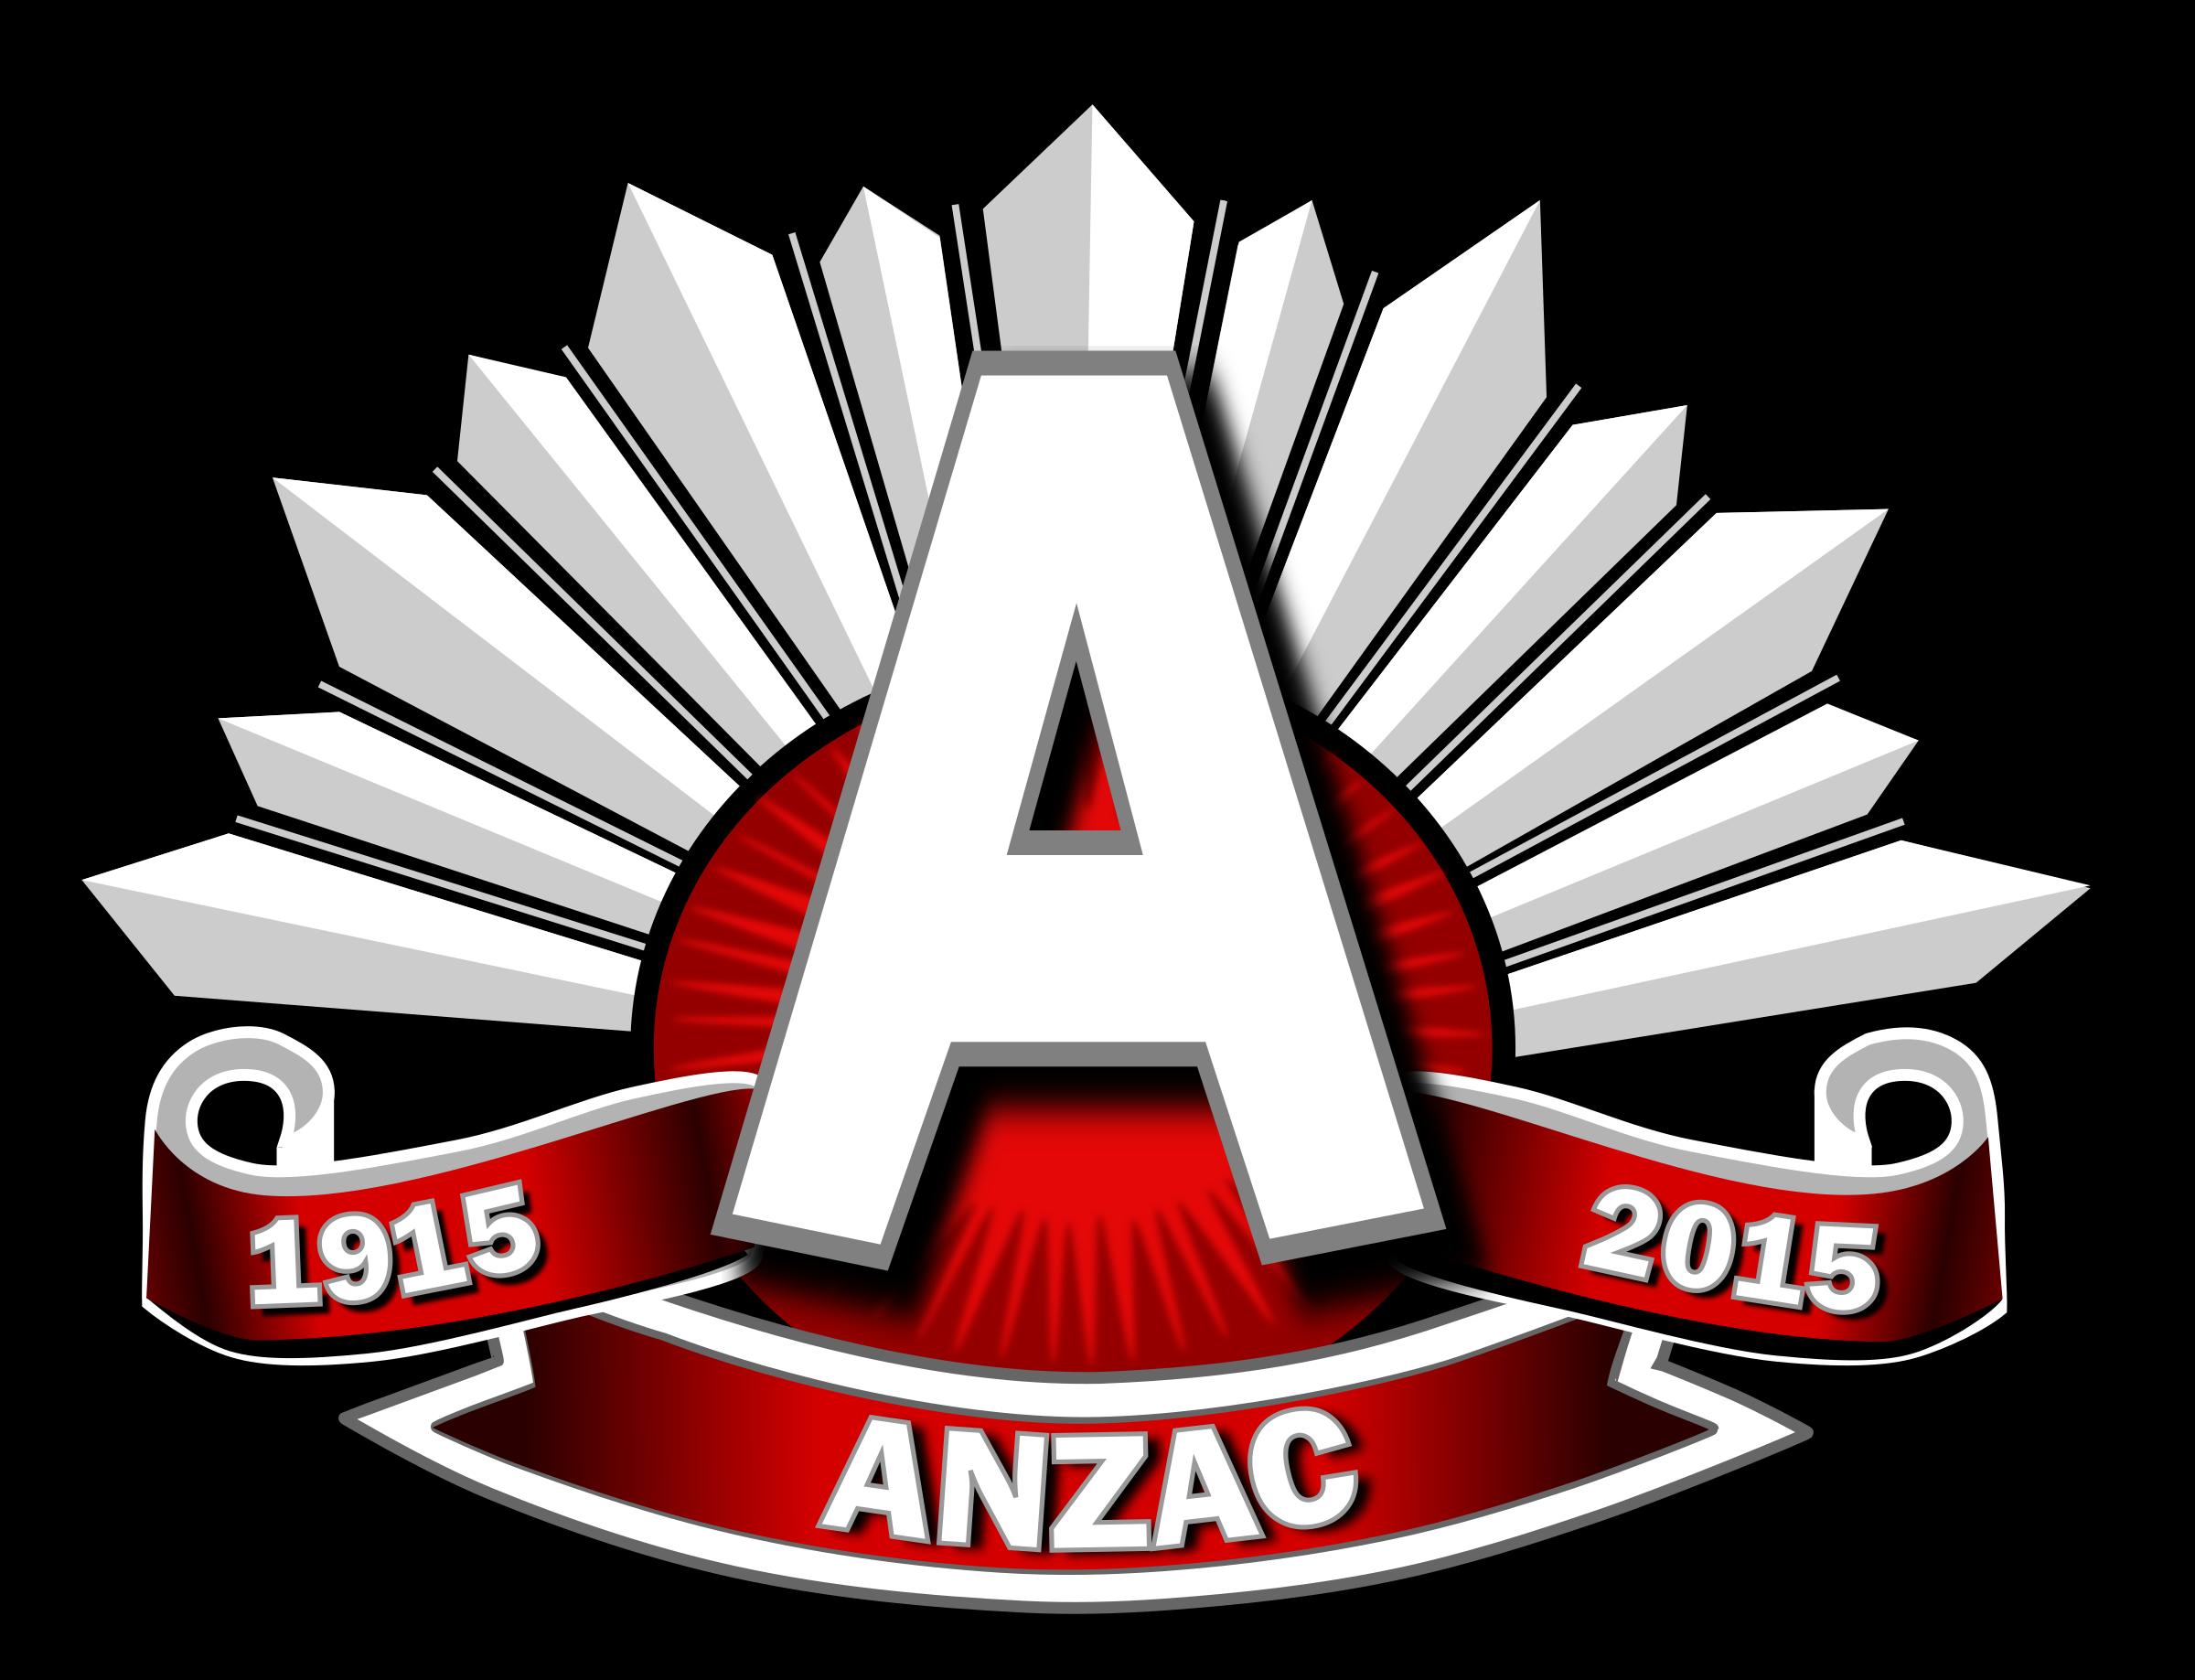 Fern clipart anzac. Logo red big image